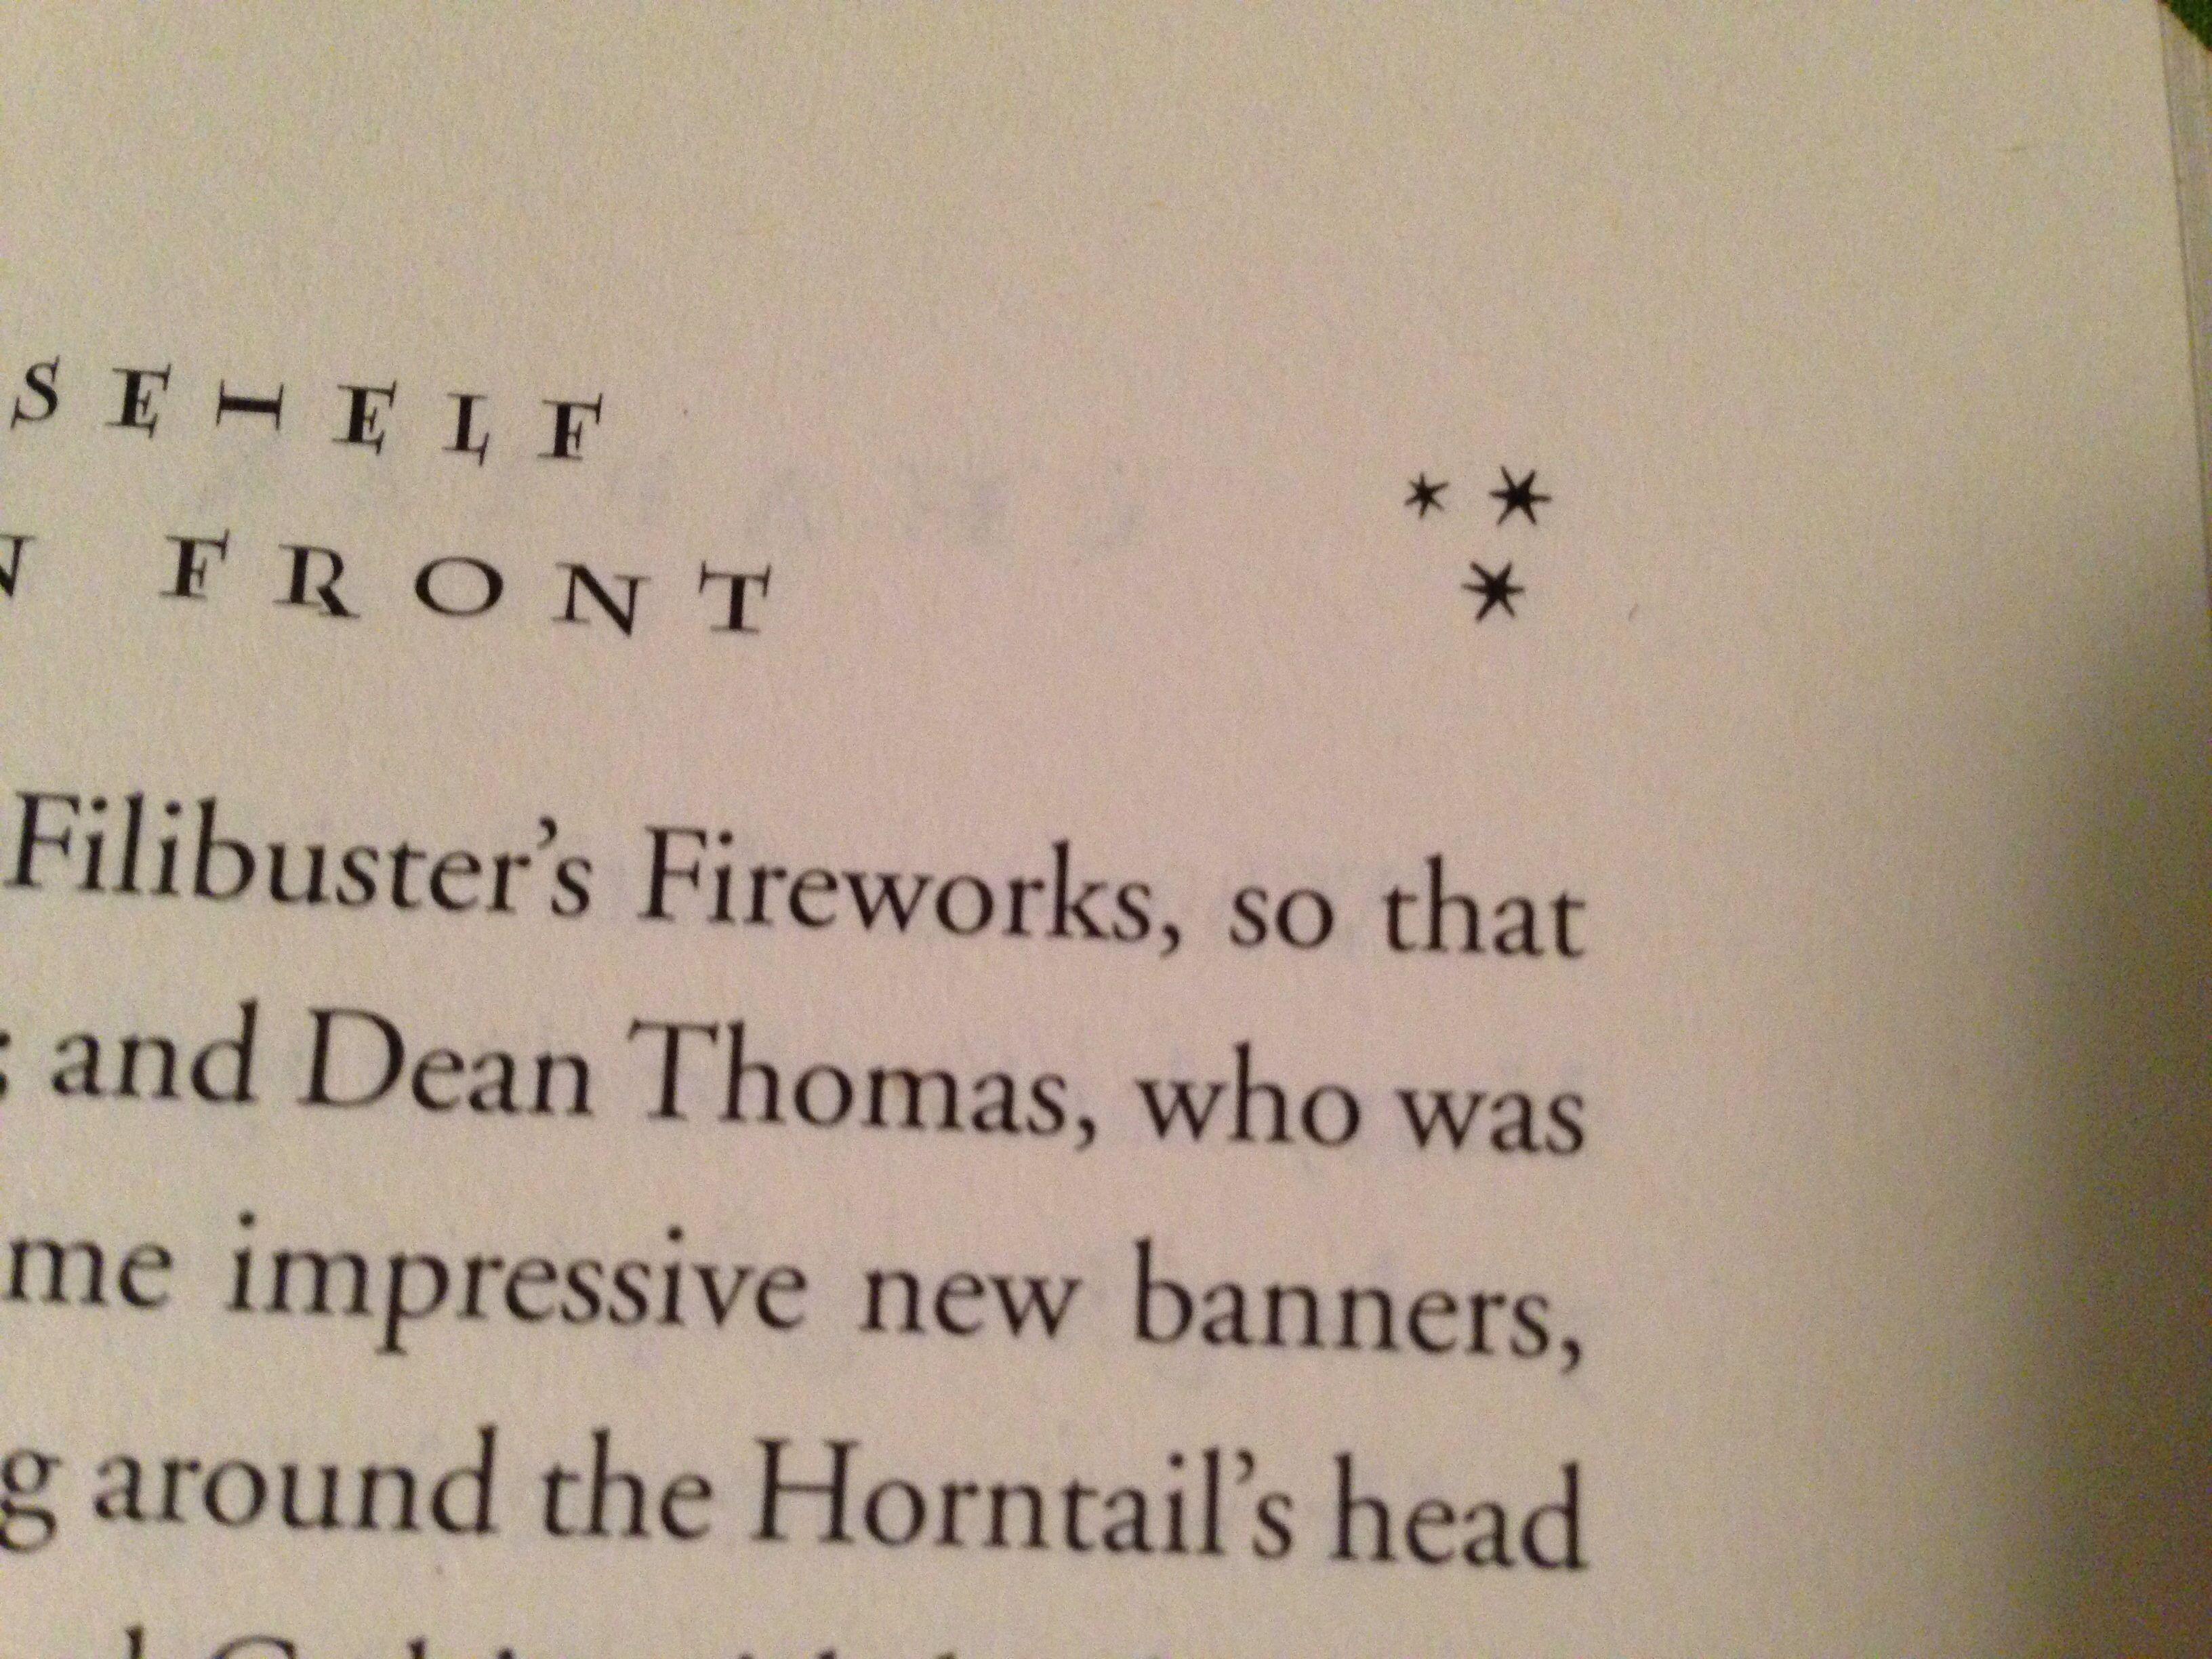 I Kinda Really Want The Stars From The Harry Potter Books Harry Potter Star Tattoo Book Tattoo Harry Potter Tattoos